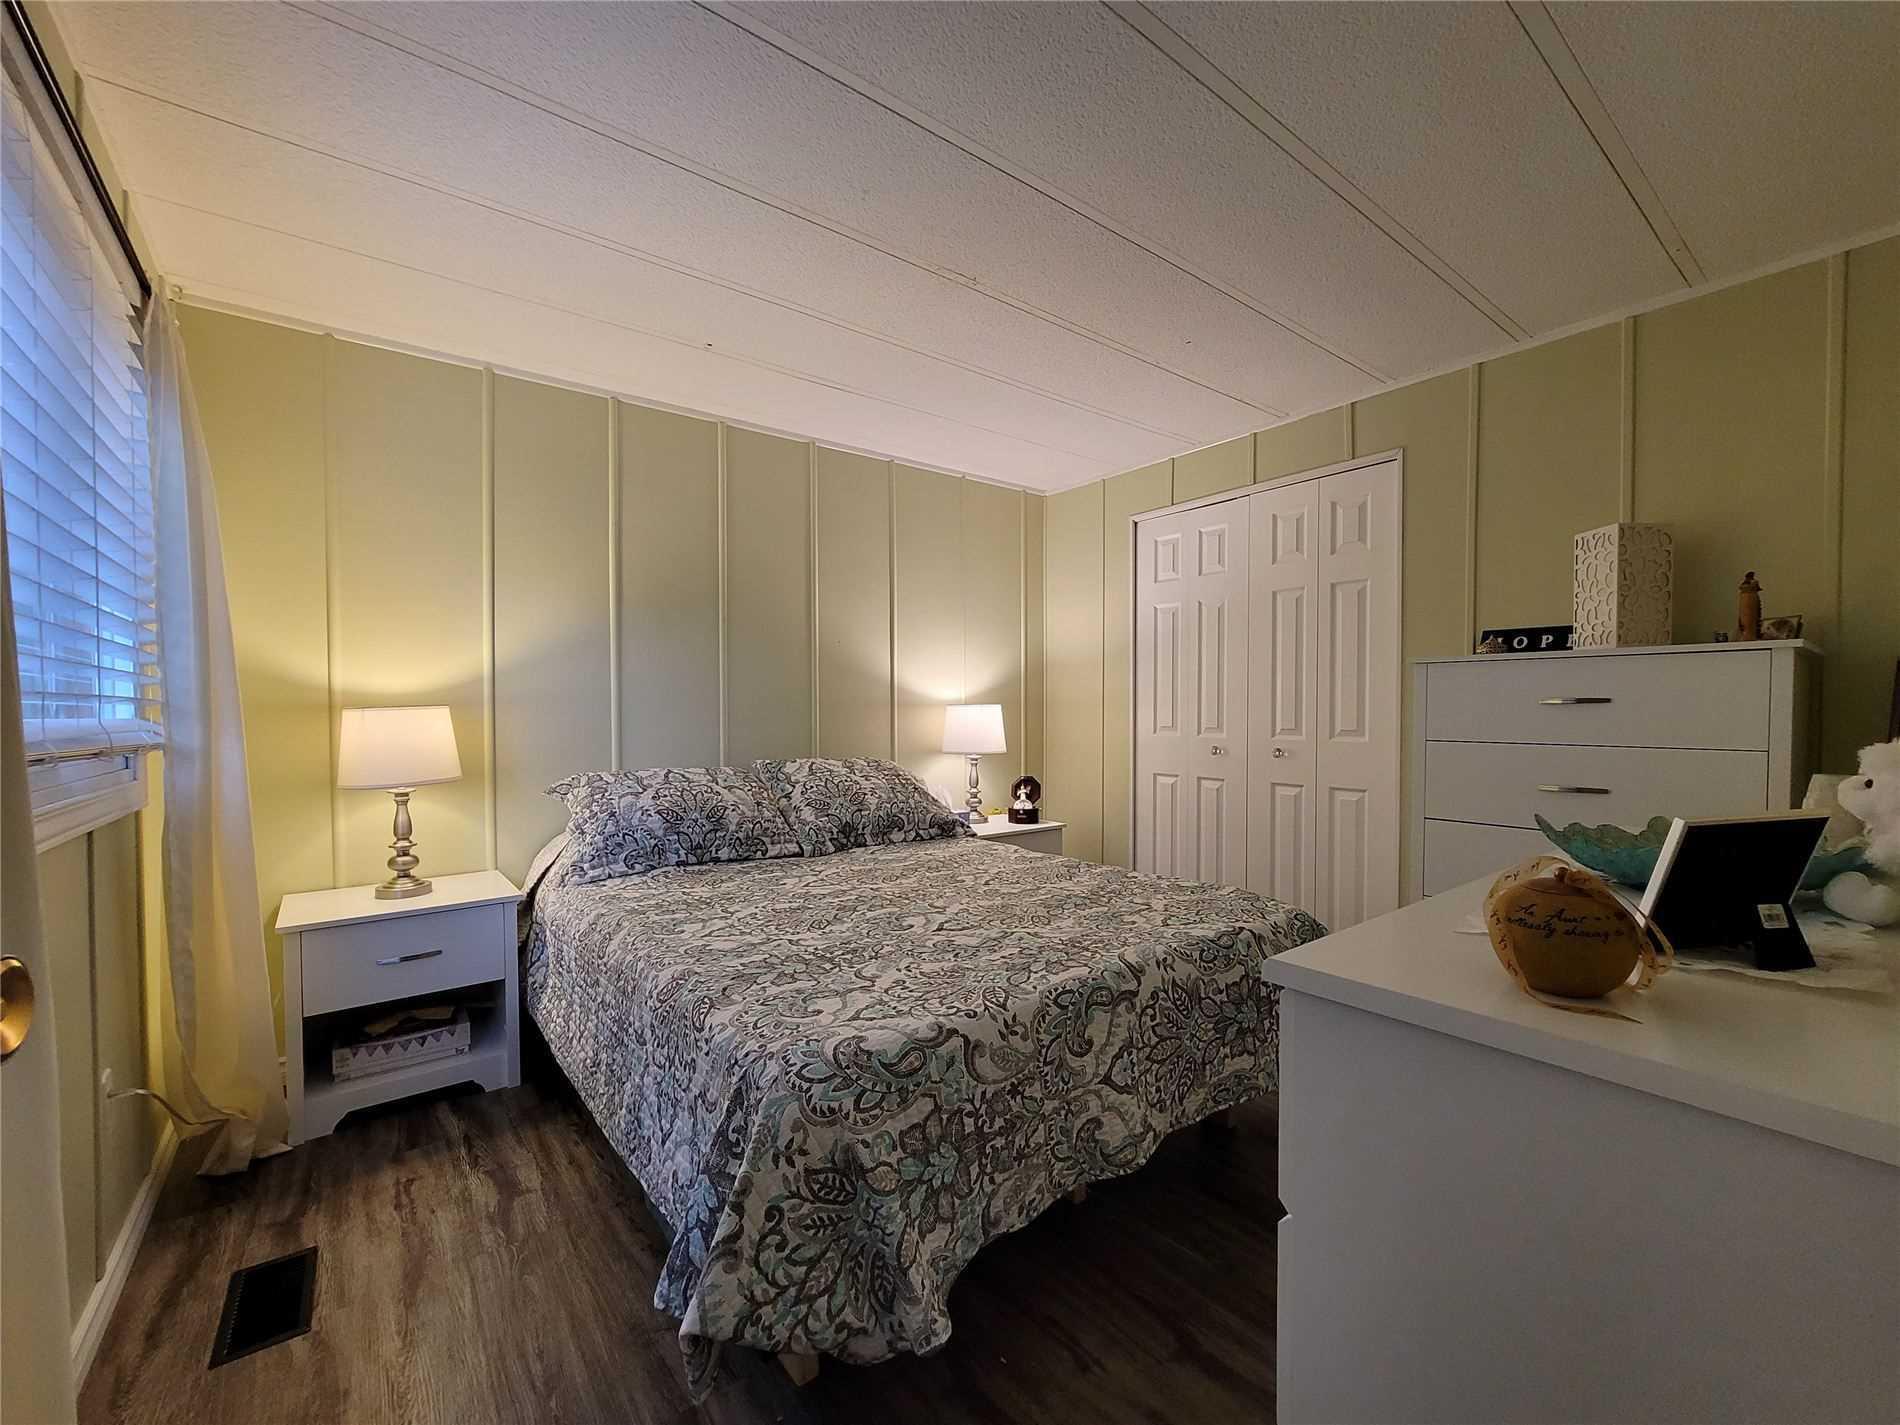 Mobile/trailer For Sale In Wasaga Beach , 3 Bedrooms Bedrooms, ,1 BathroomBathrooms,Mobile/trailer,For Sale,Georgian Glen